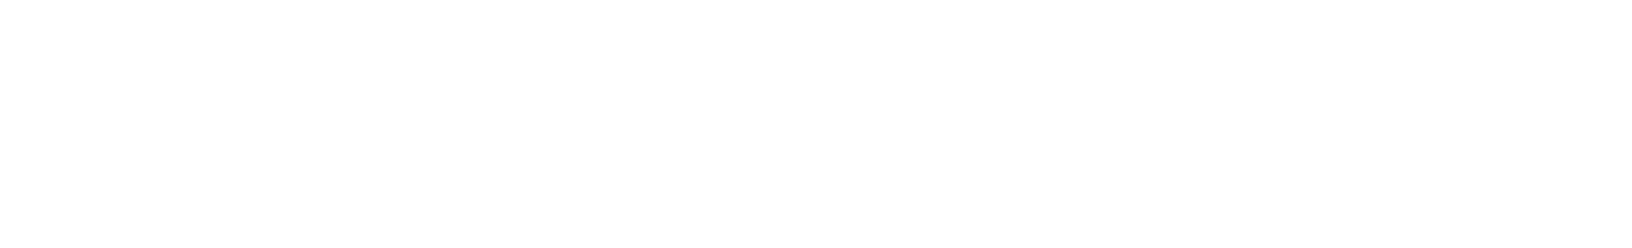 game-changer-header